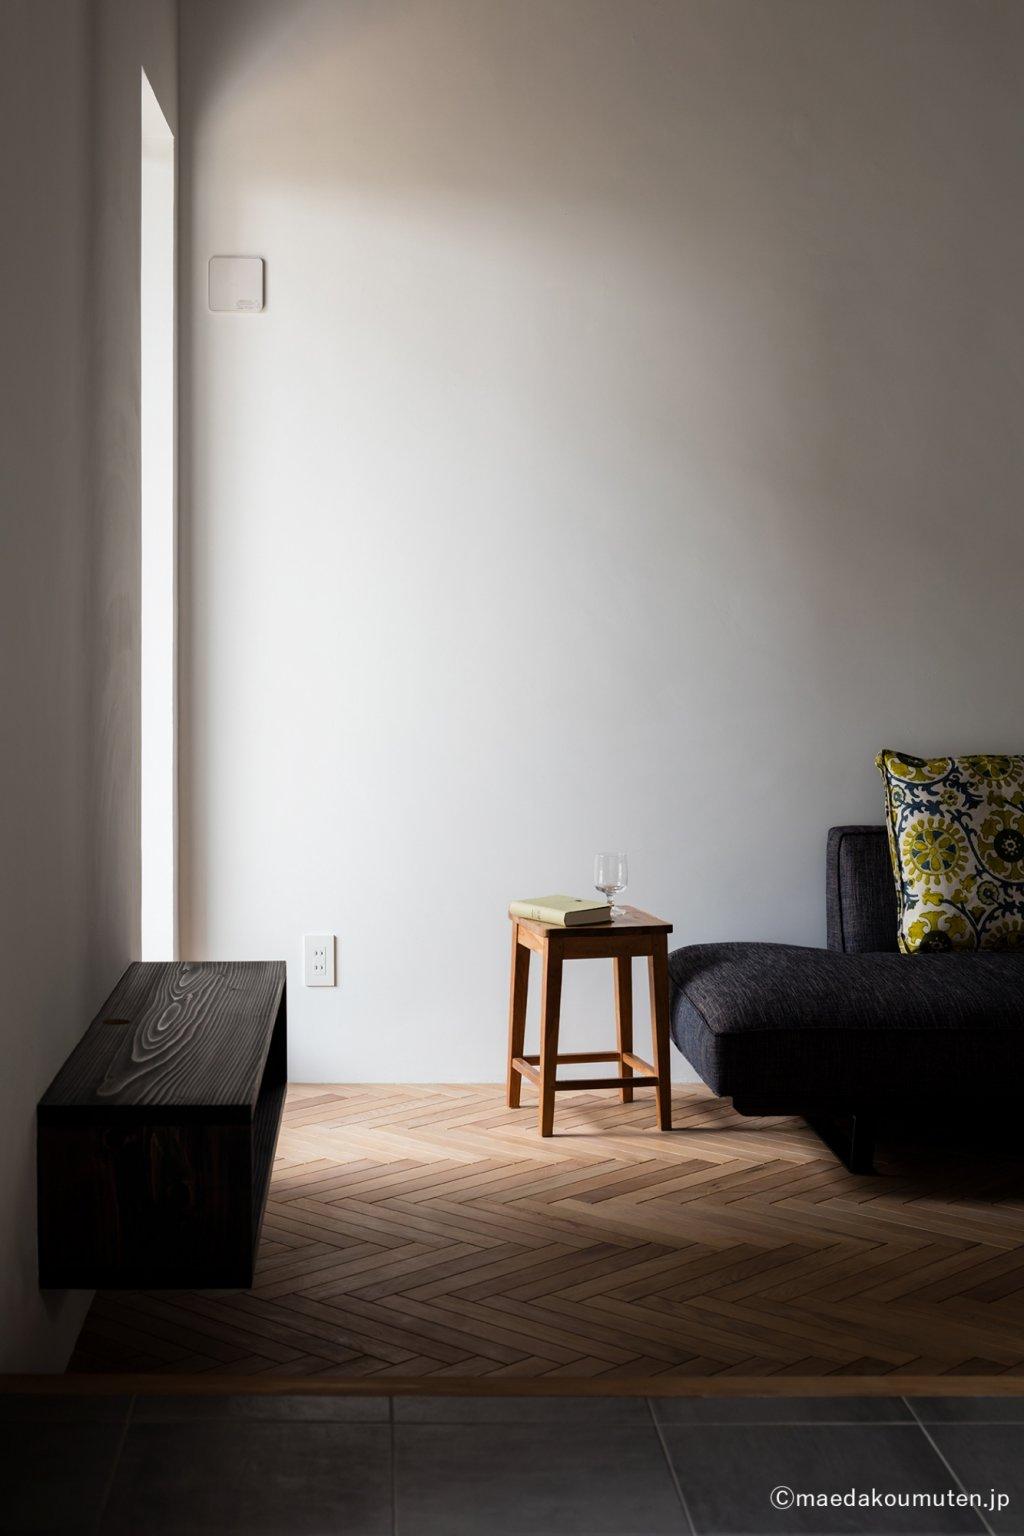 神奈川、工務店、注文住宅、デザイン住宅、建築家、大島の家、19